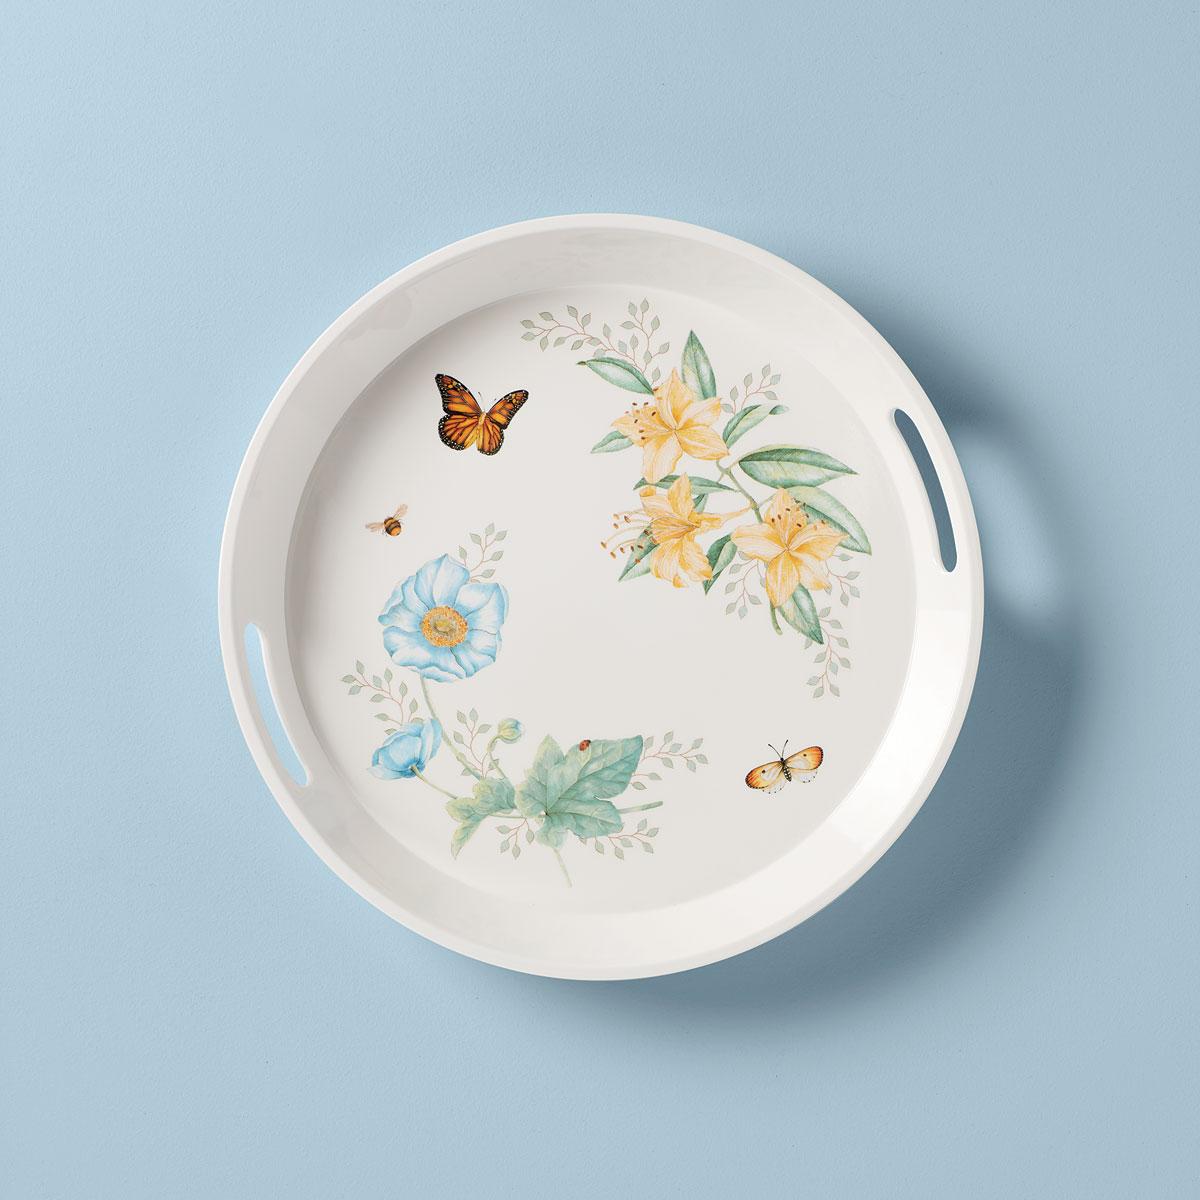 Lenox Butterfly Meadow Melamine Dinnerware Round Tray